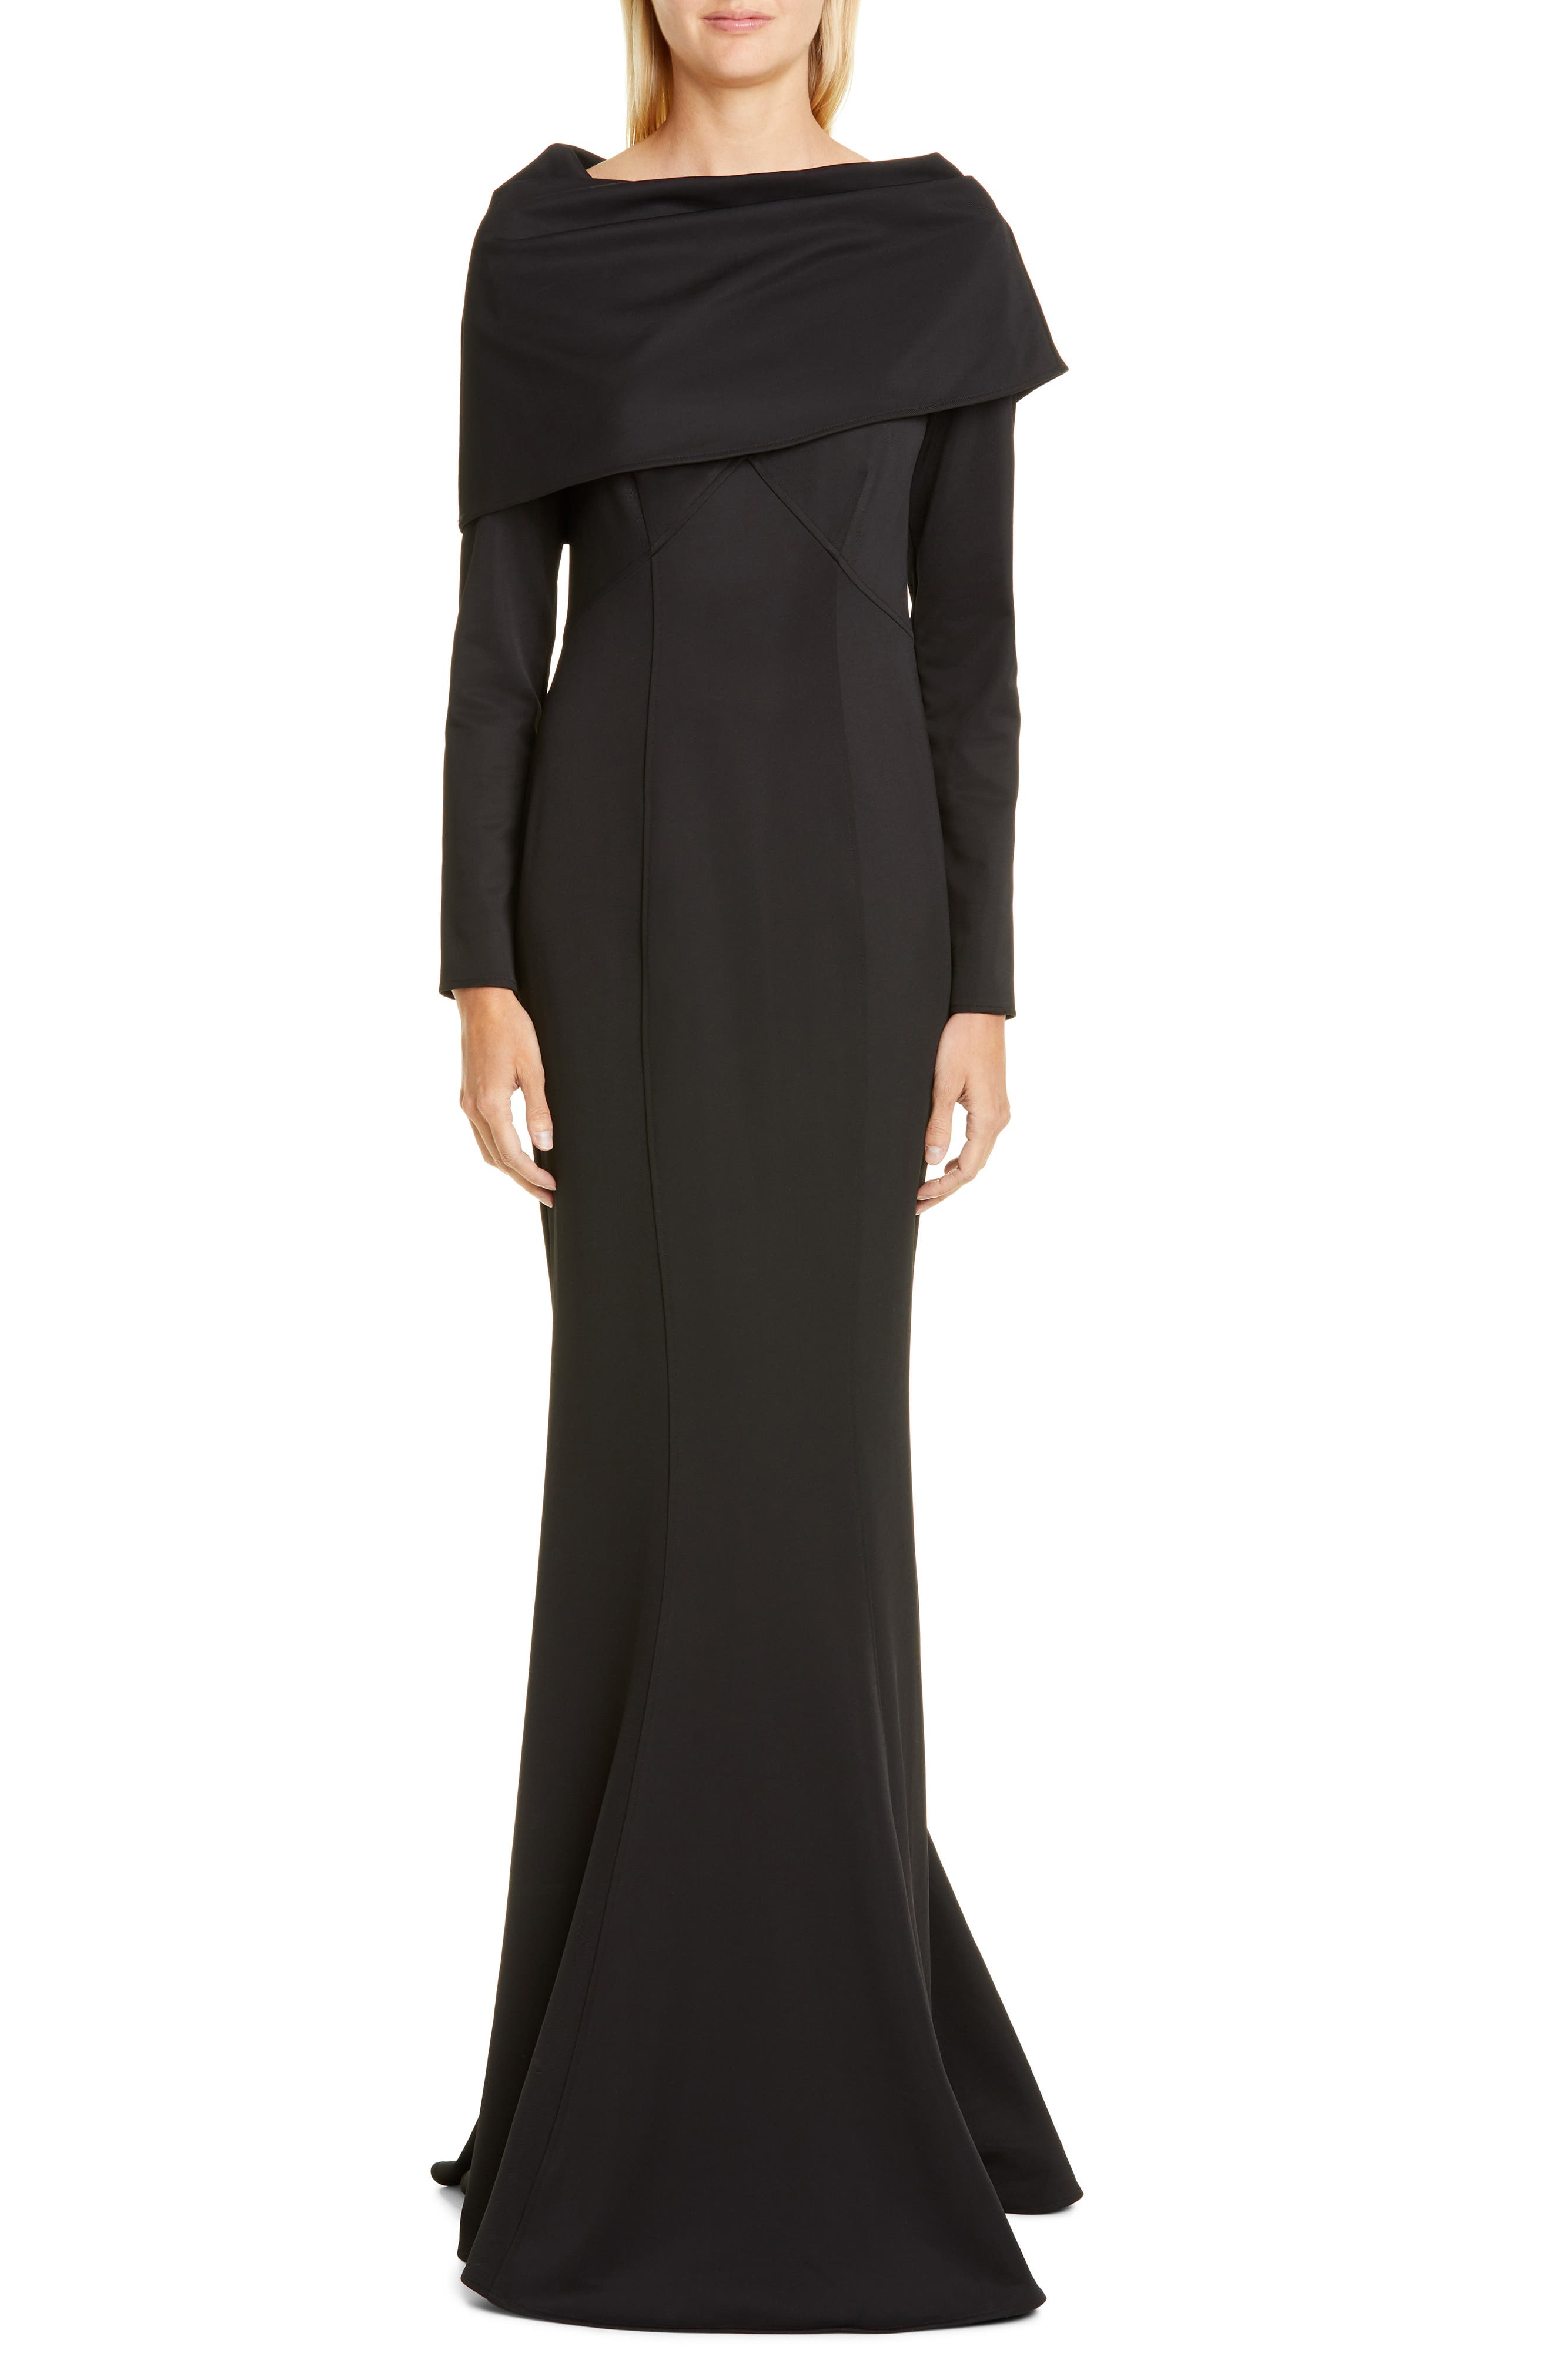 Zac Zac Posen Tali Long Sleeve Gown, Black